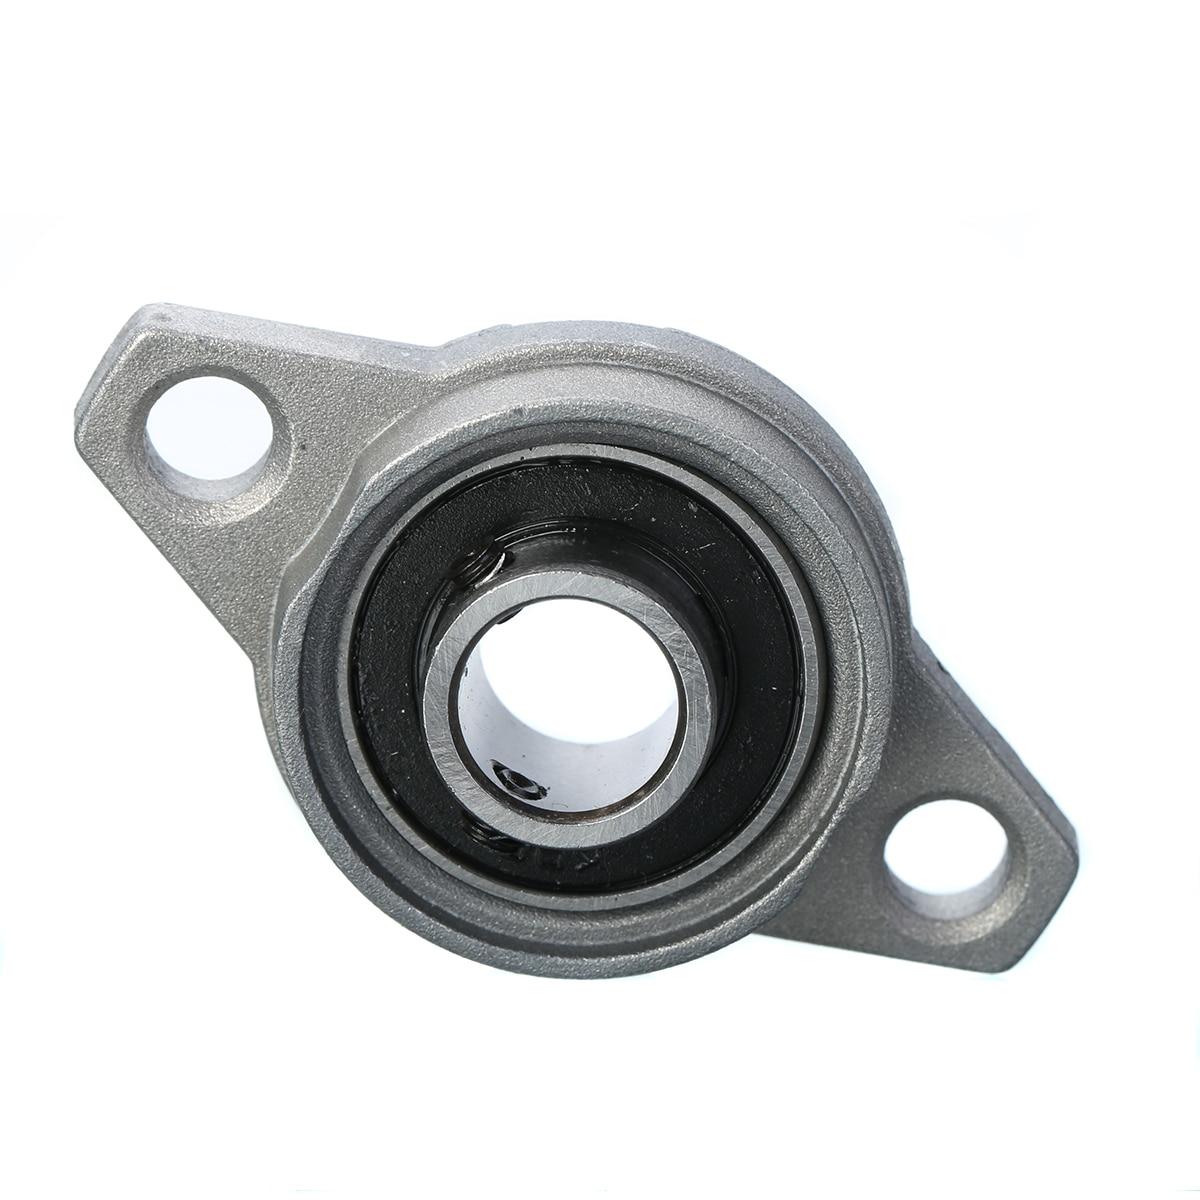 diameter pillow bearing locking block felt bearings mp housing two iron cast sealmaster seal standard setscrew bolt